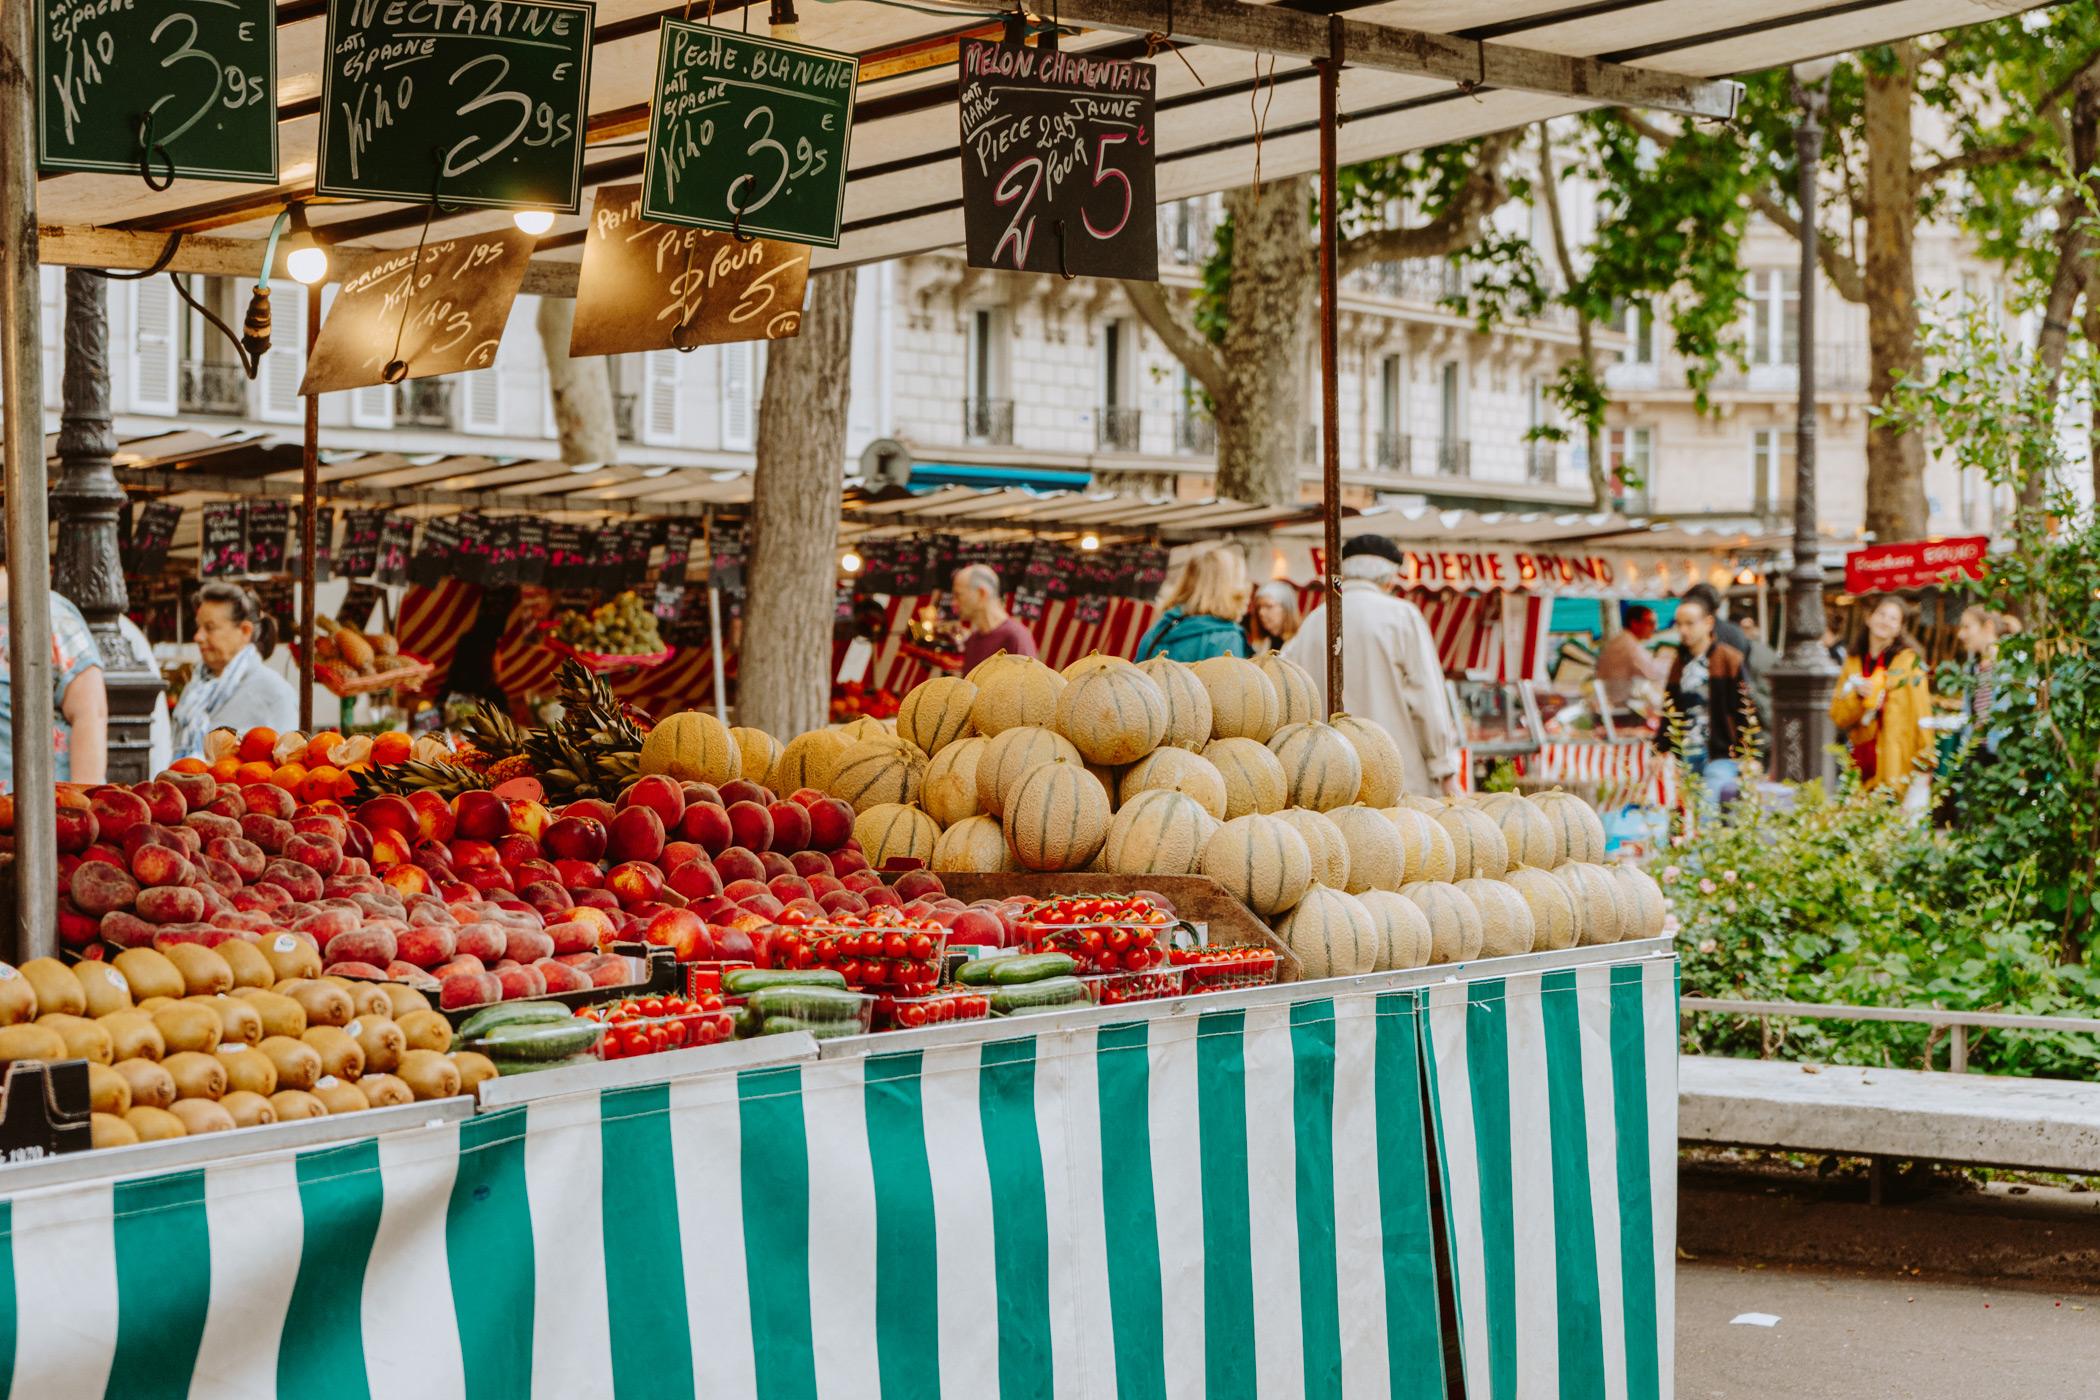 Marche Bastille farmers market.